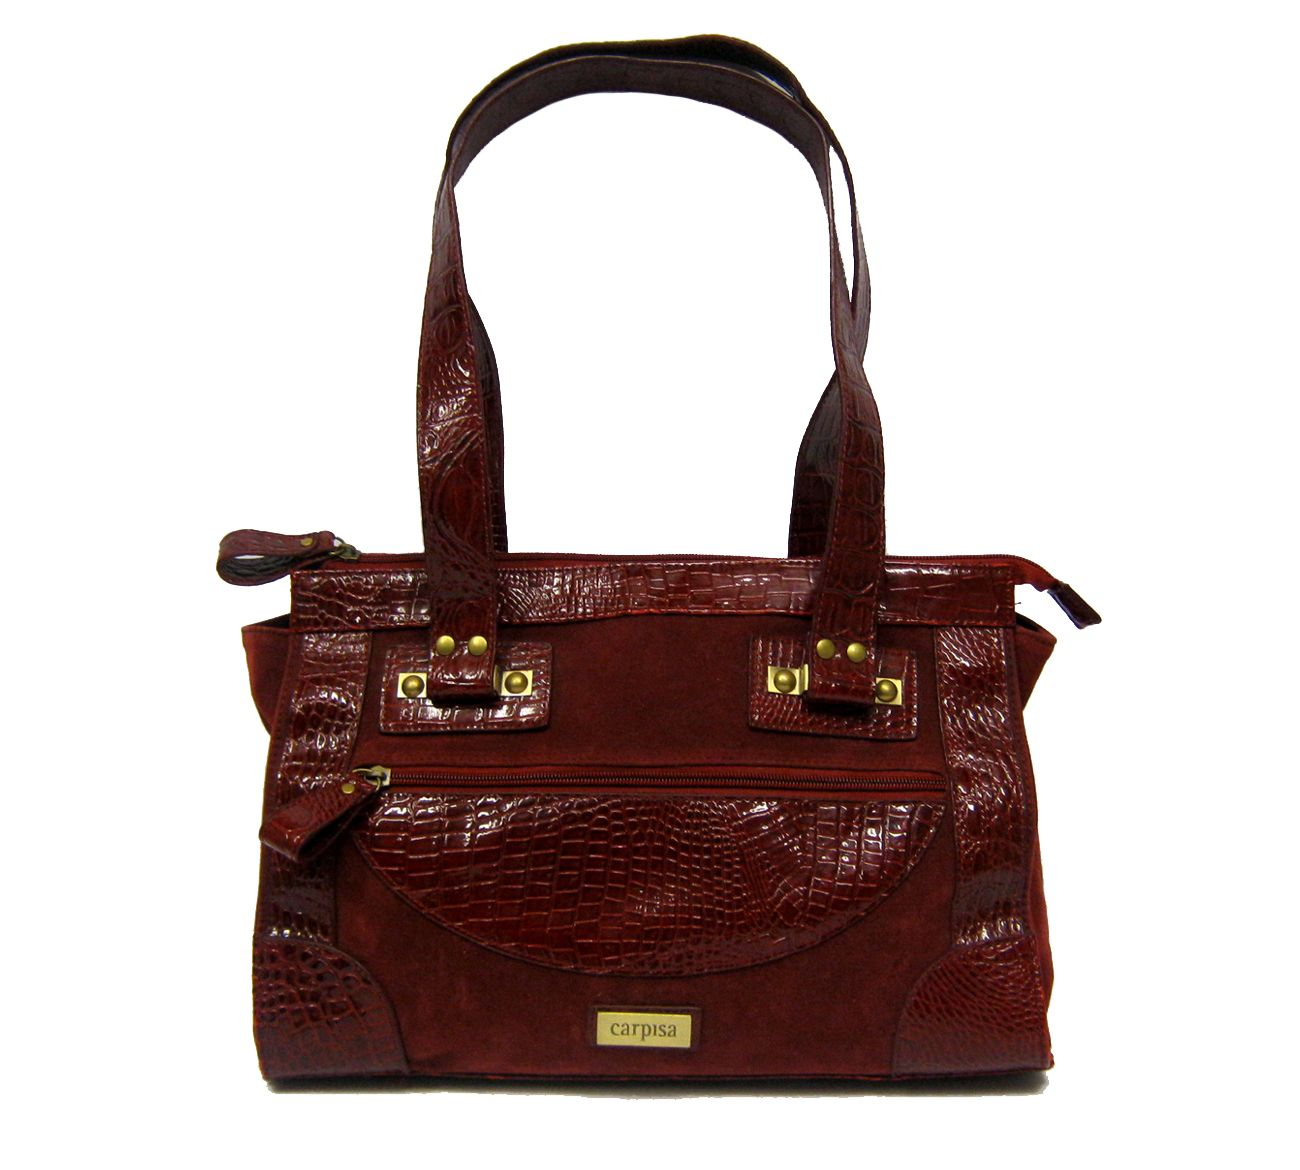 CARPISA MOCK CROC BAG. Unbeatable prices at myerafashion.com! £24.99 ... 7ecc9e8af4